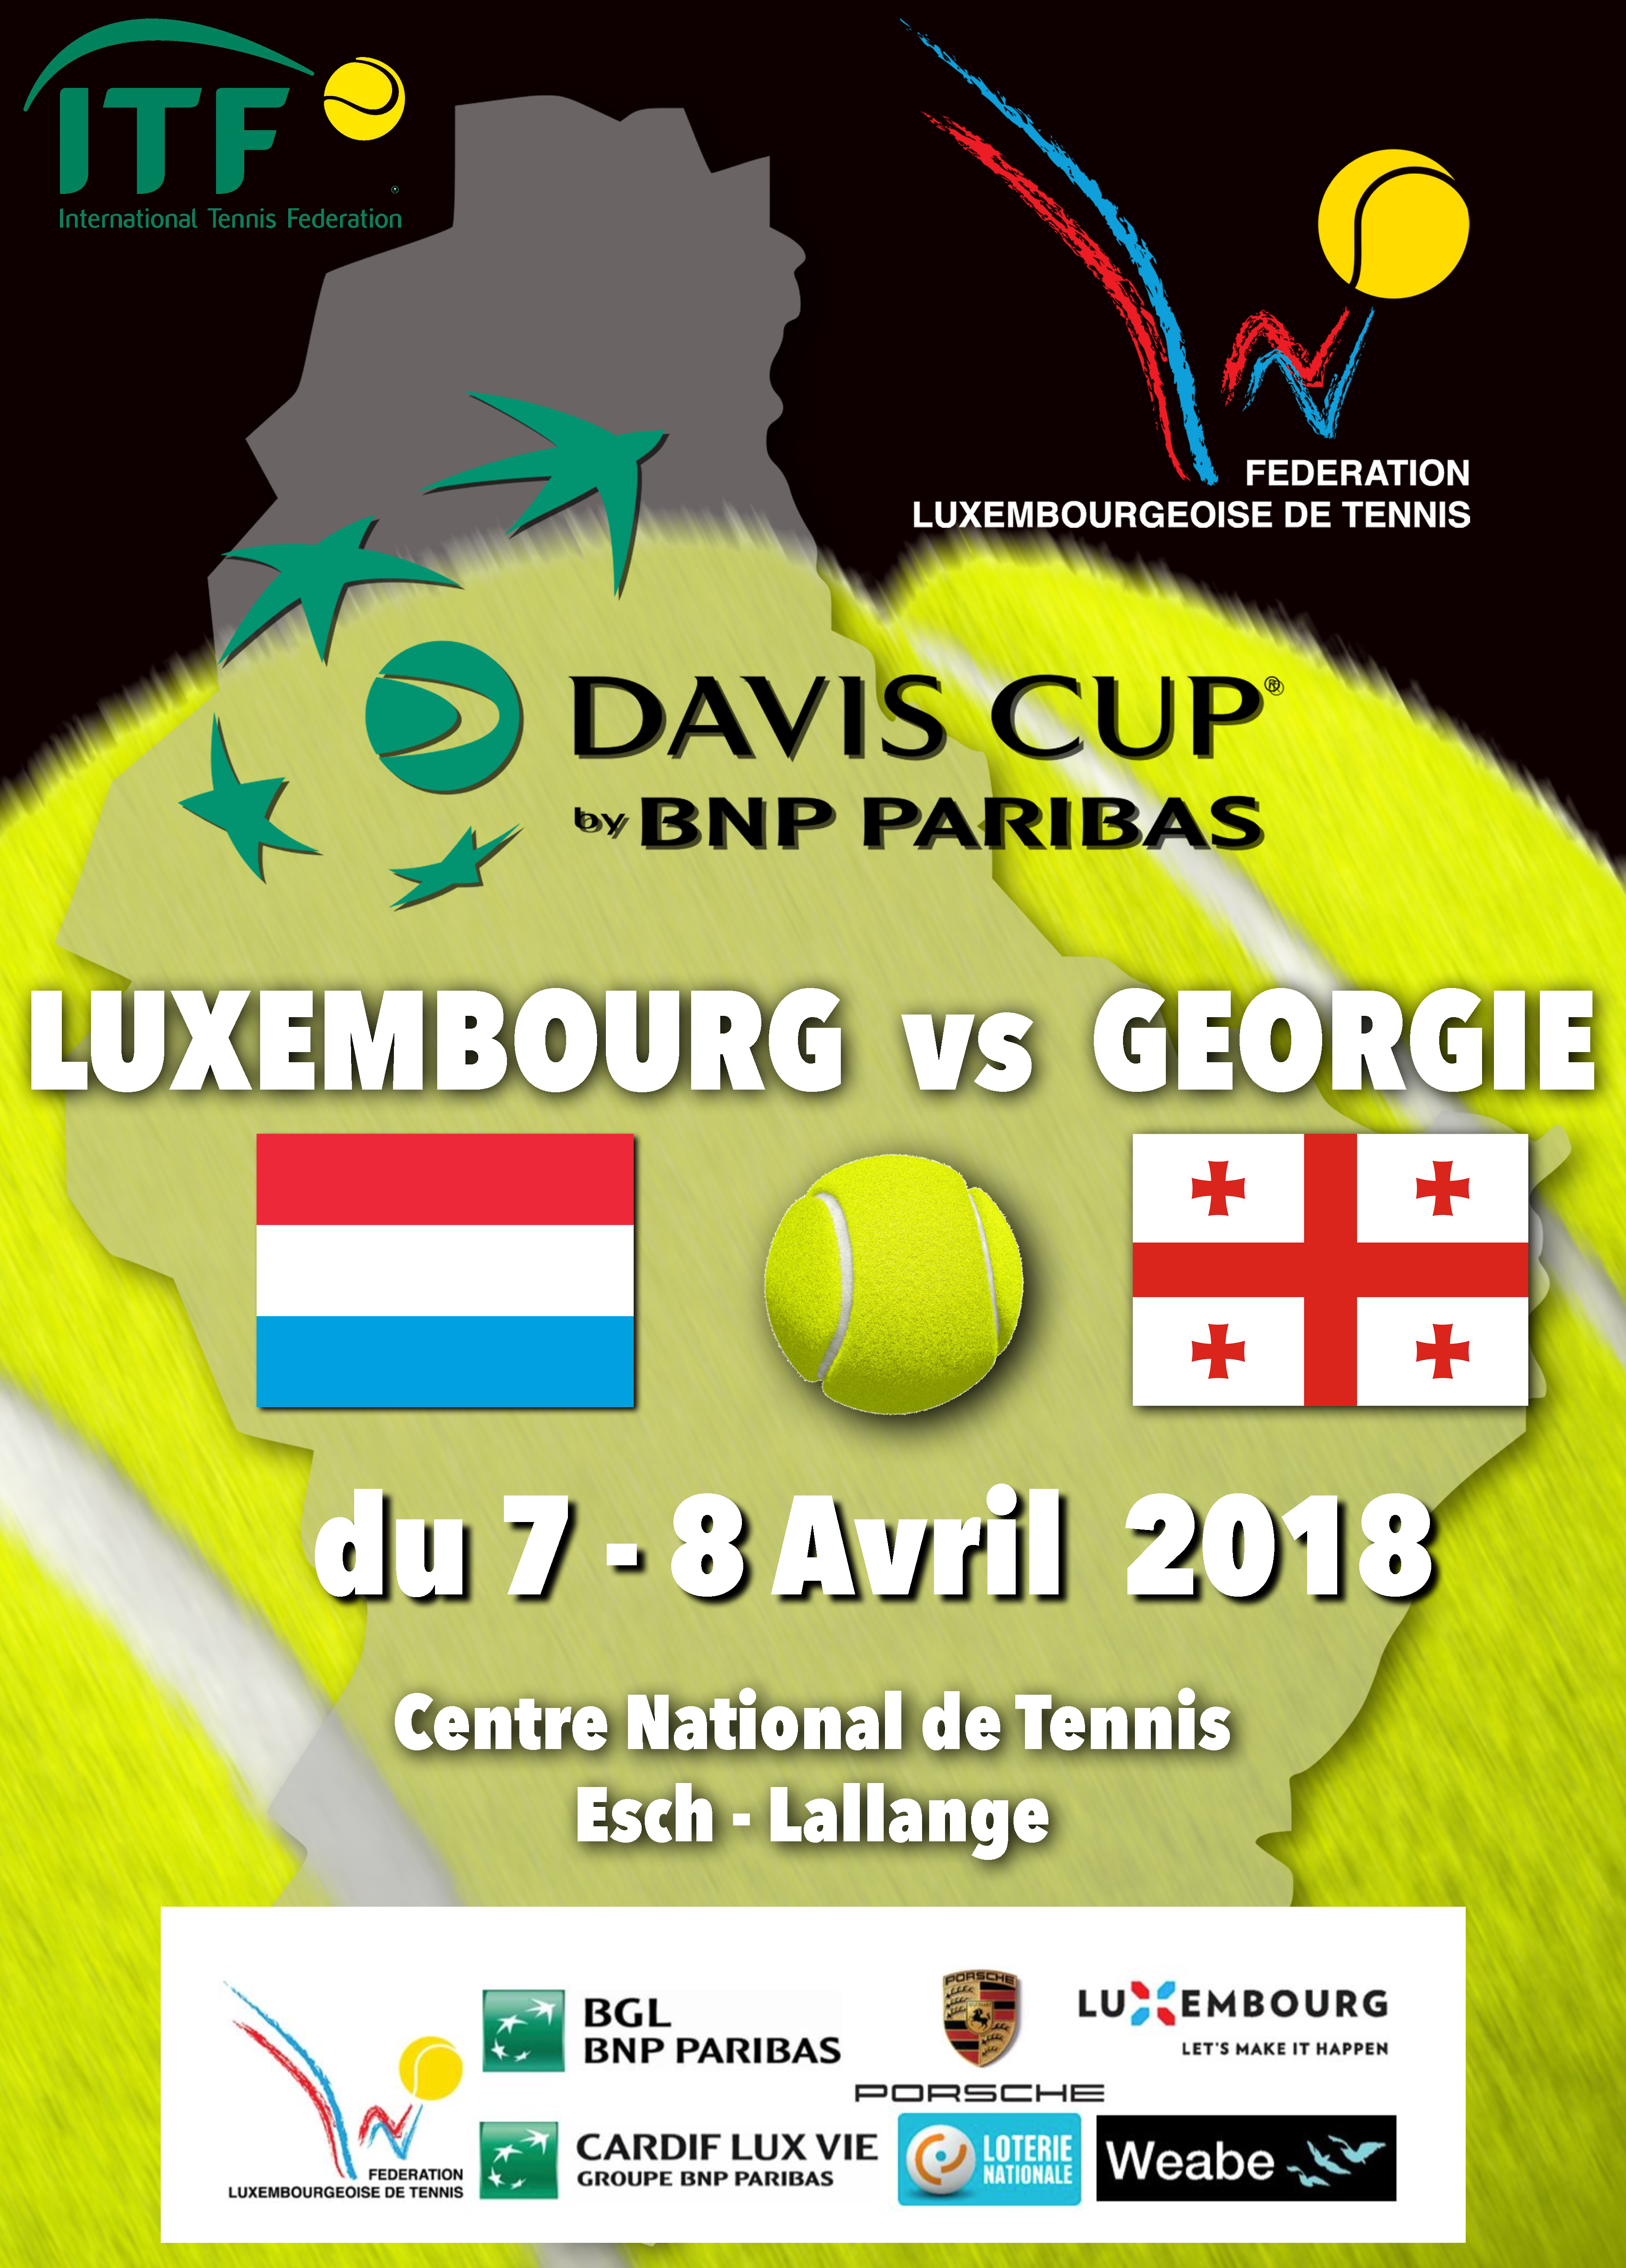 TENNIS DAVIS CUP 2018